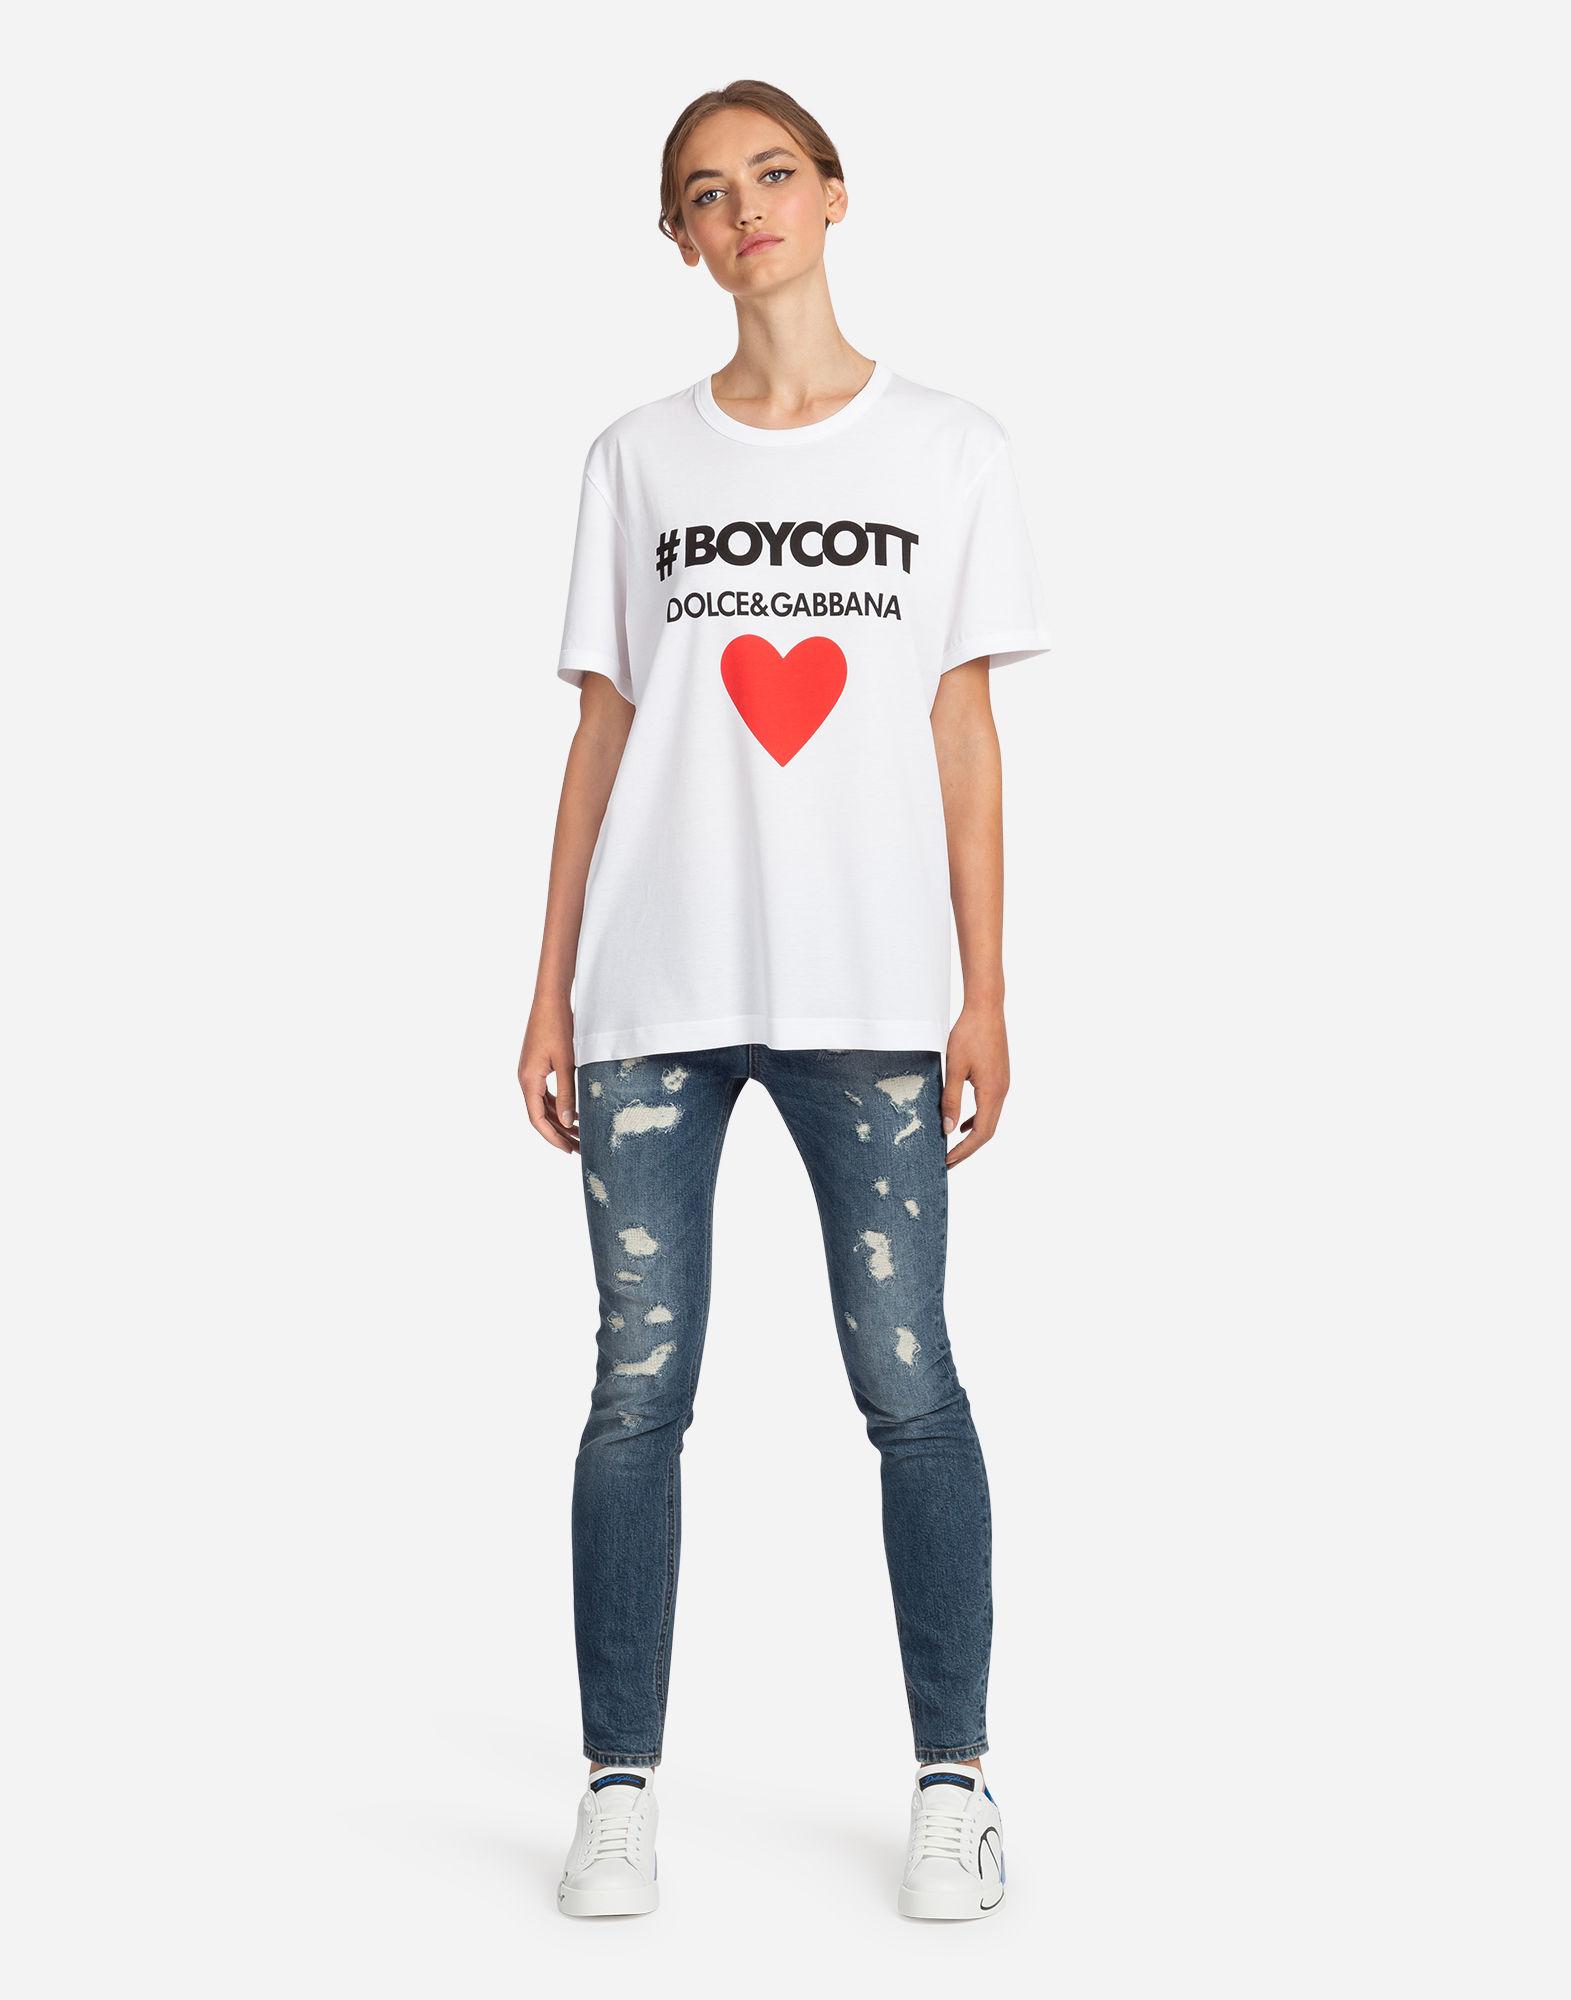 Dolce & Gabbana Boycott Printed Cotton Jersey T-shirt In White